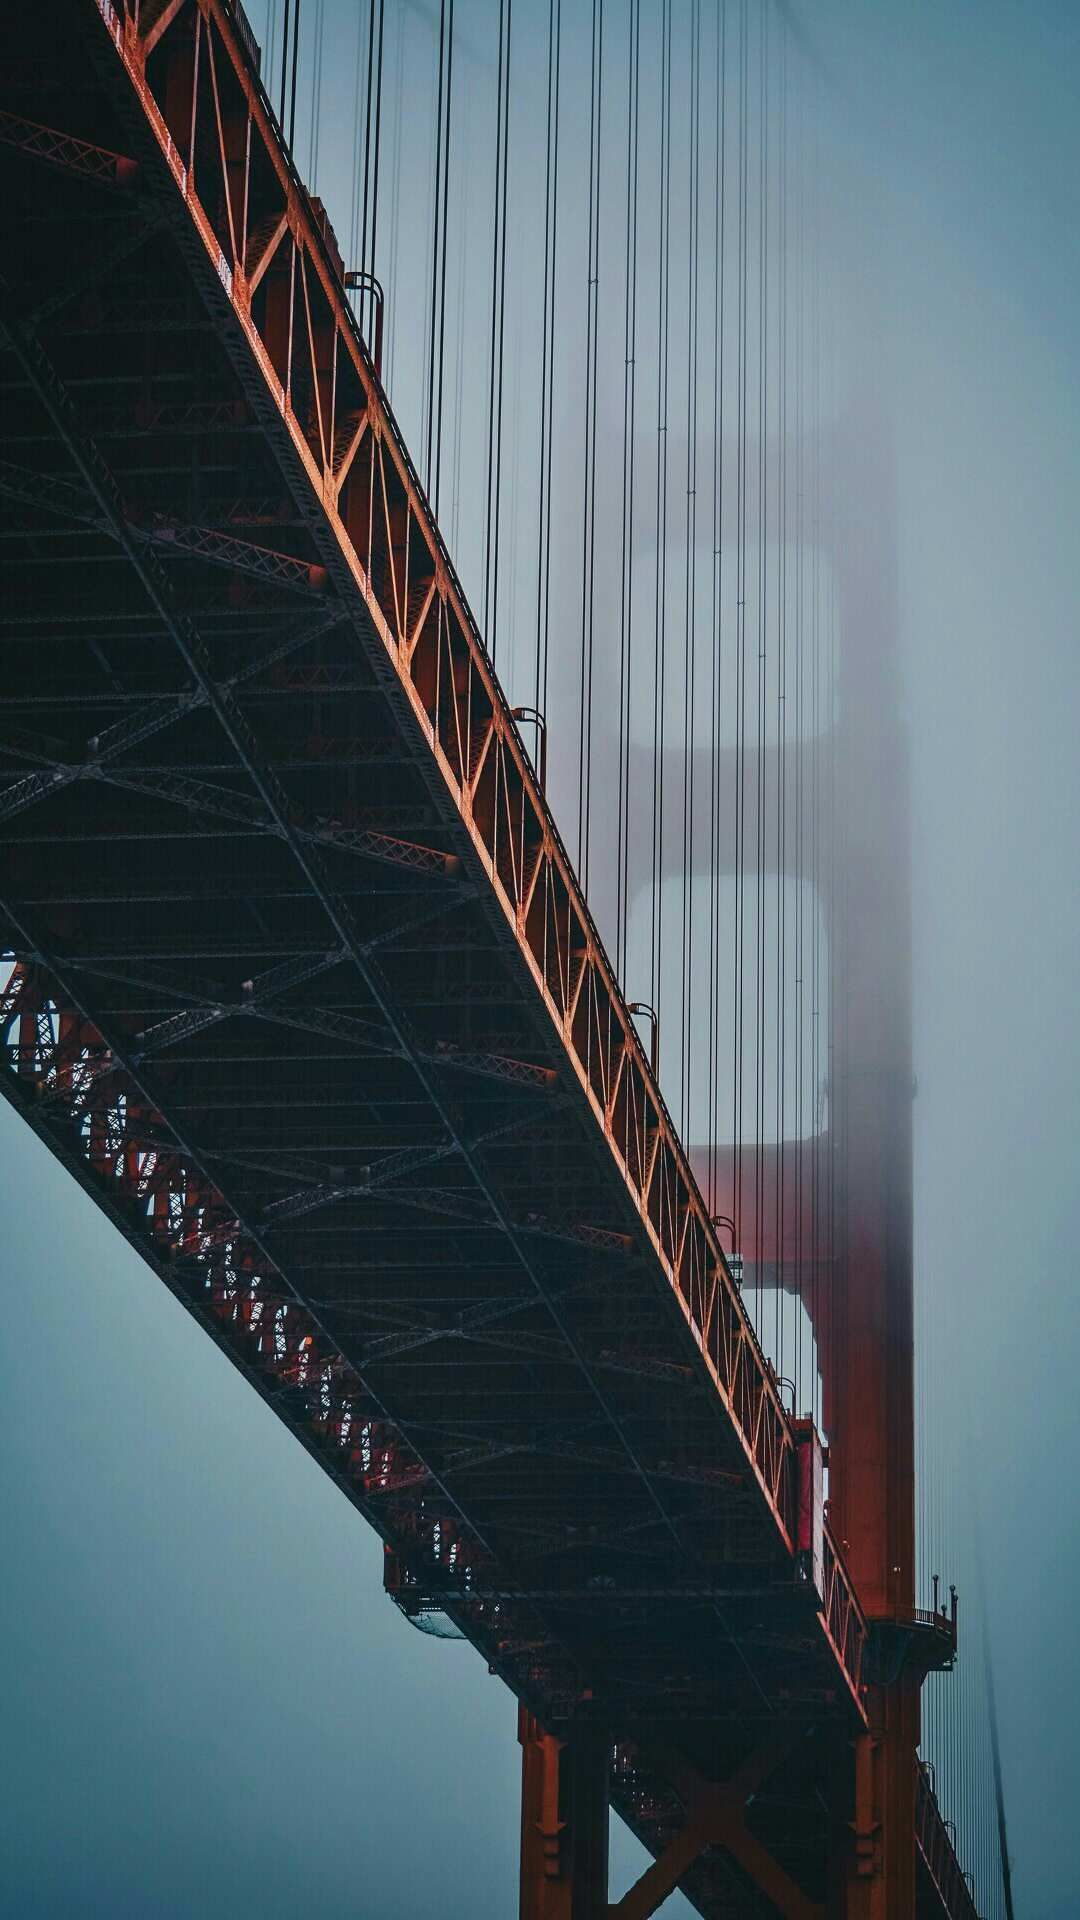 Golden Gate Bridge Fog Iphone Wallpaper In 2019 Bridge